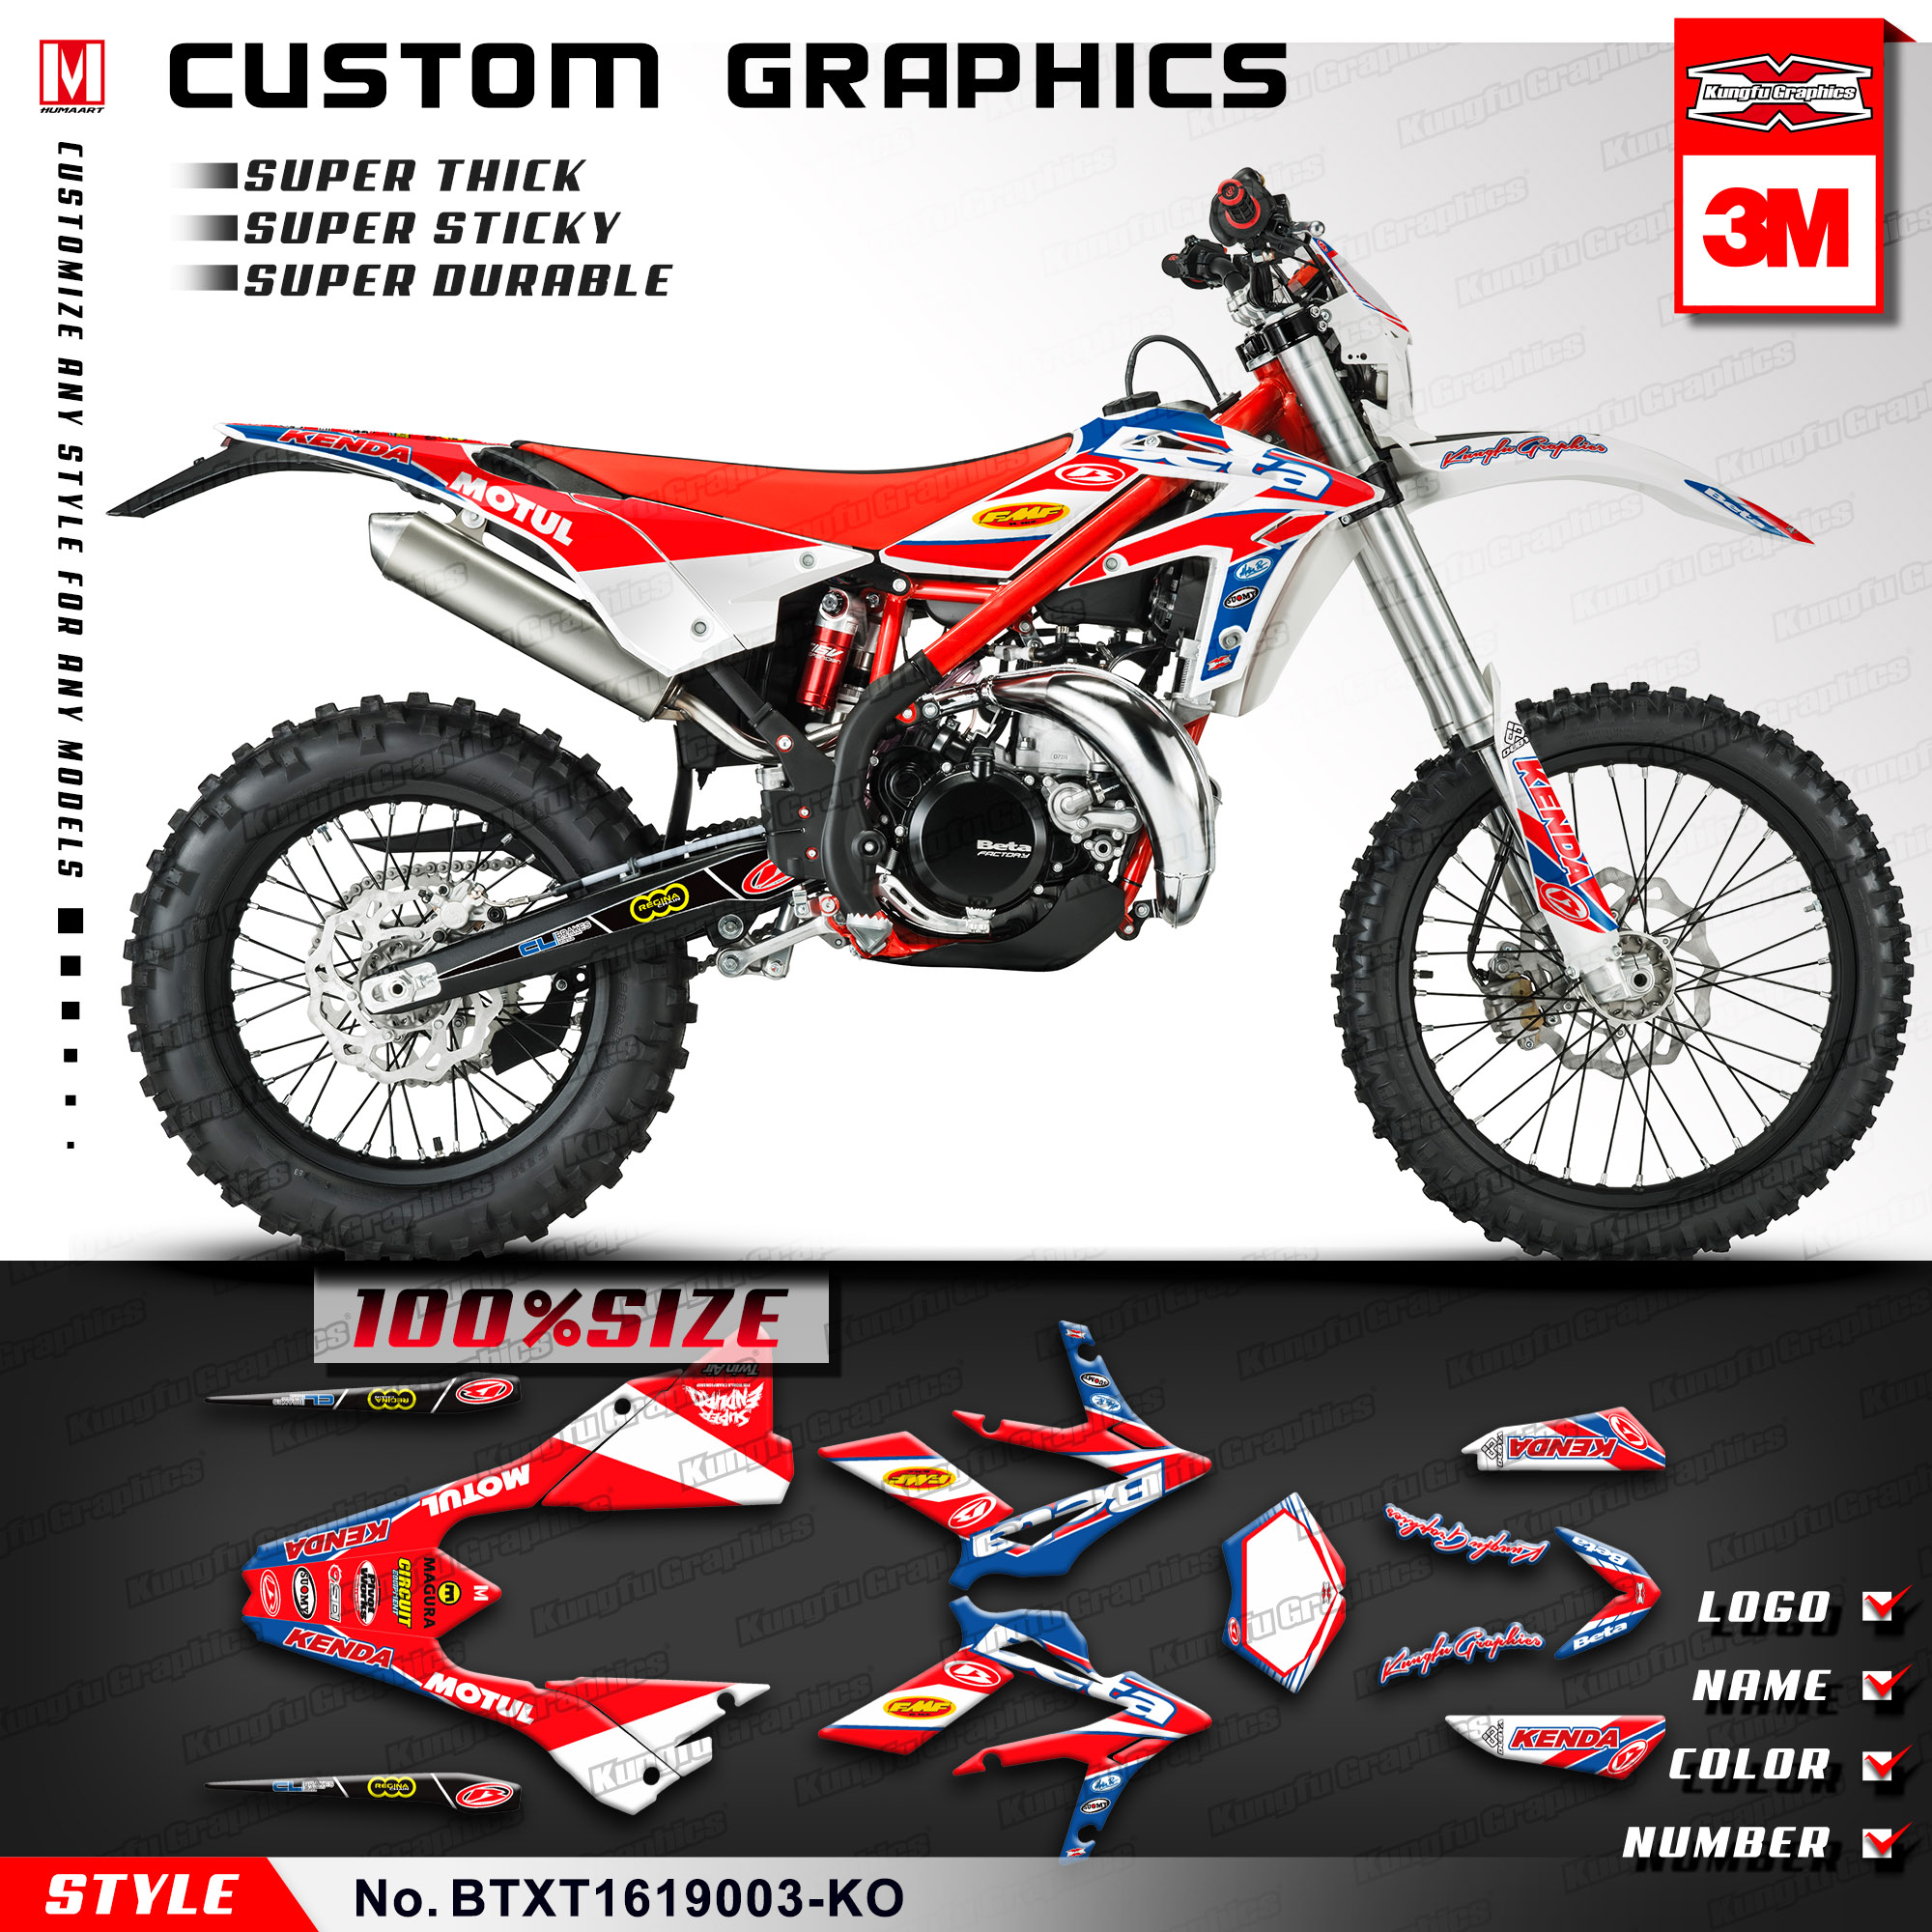 Beta Decals Stickers Motorcycle Vinyl Graphics Kit Autocollant Aufkleber Adesivi